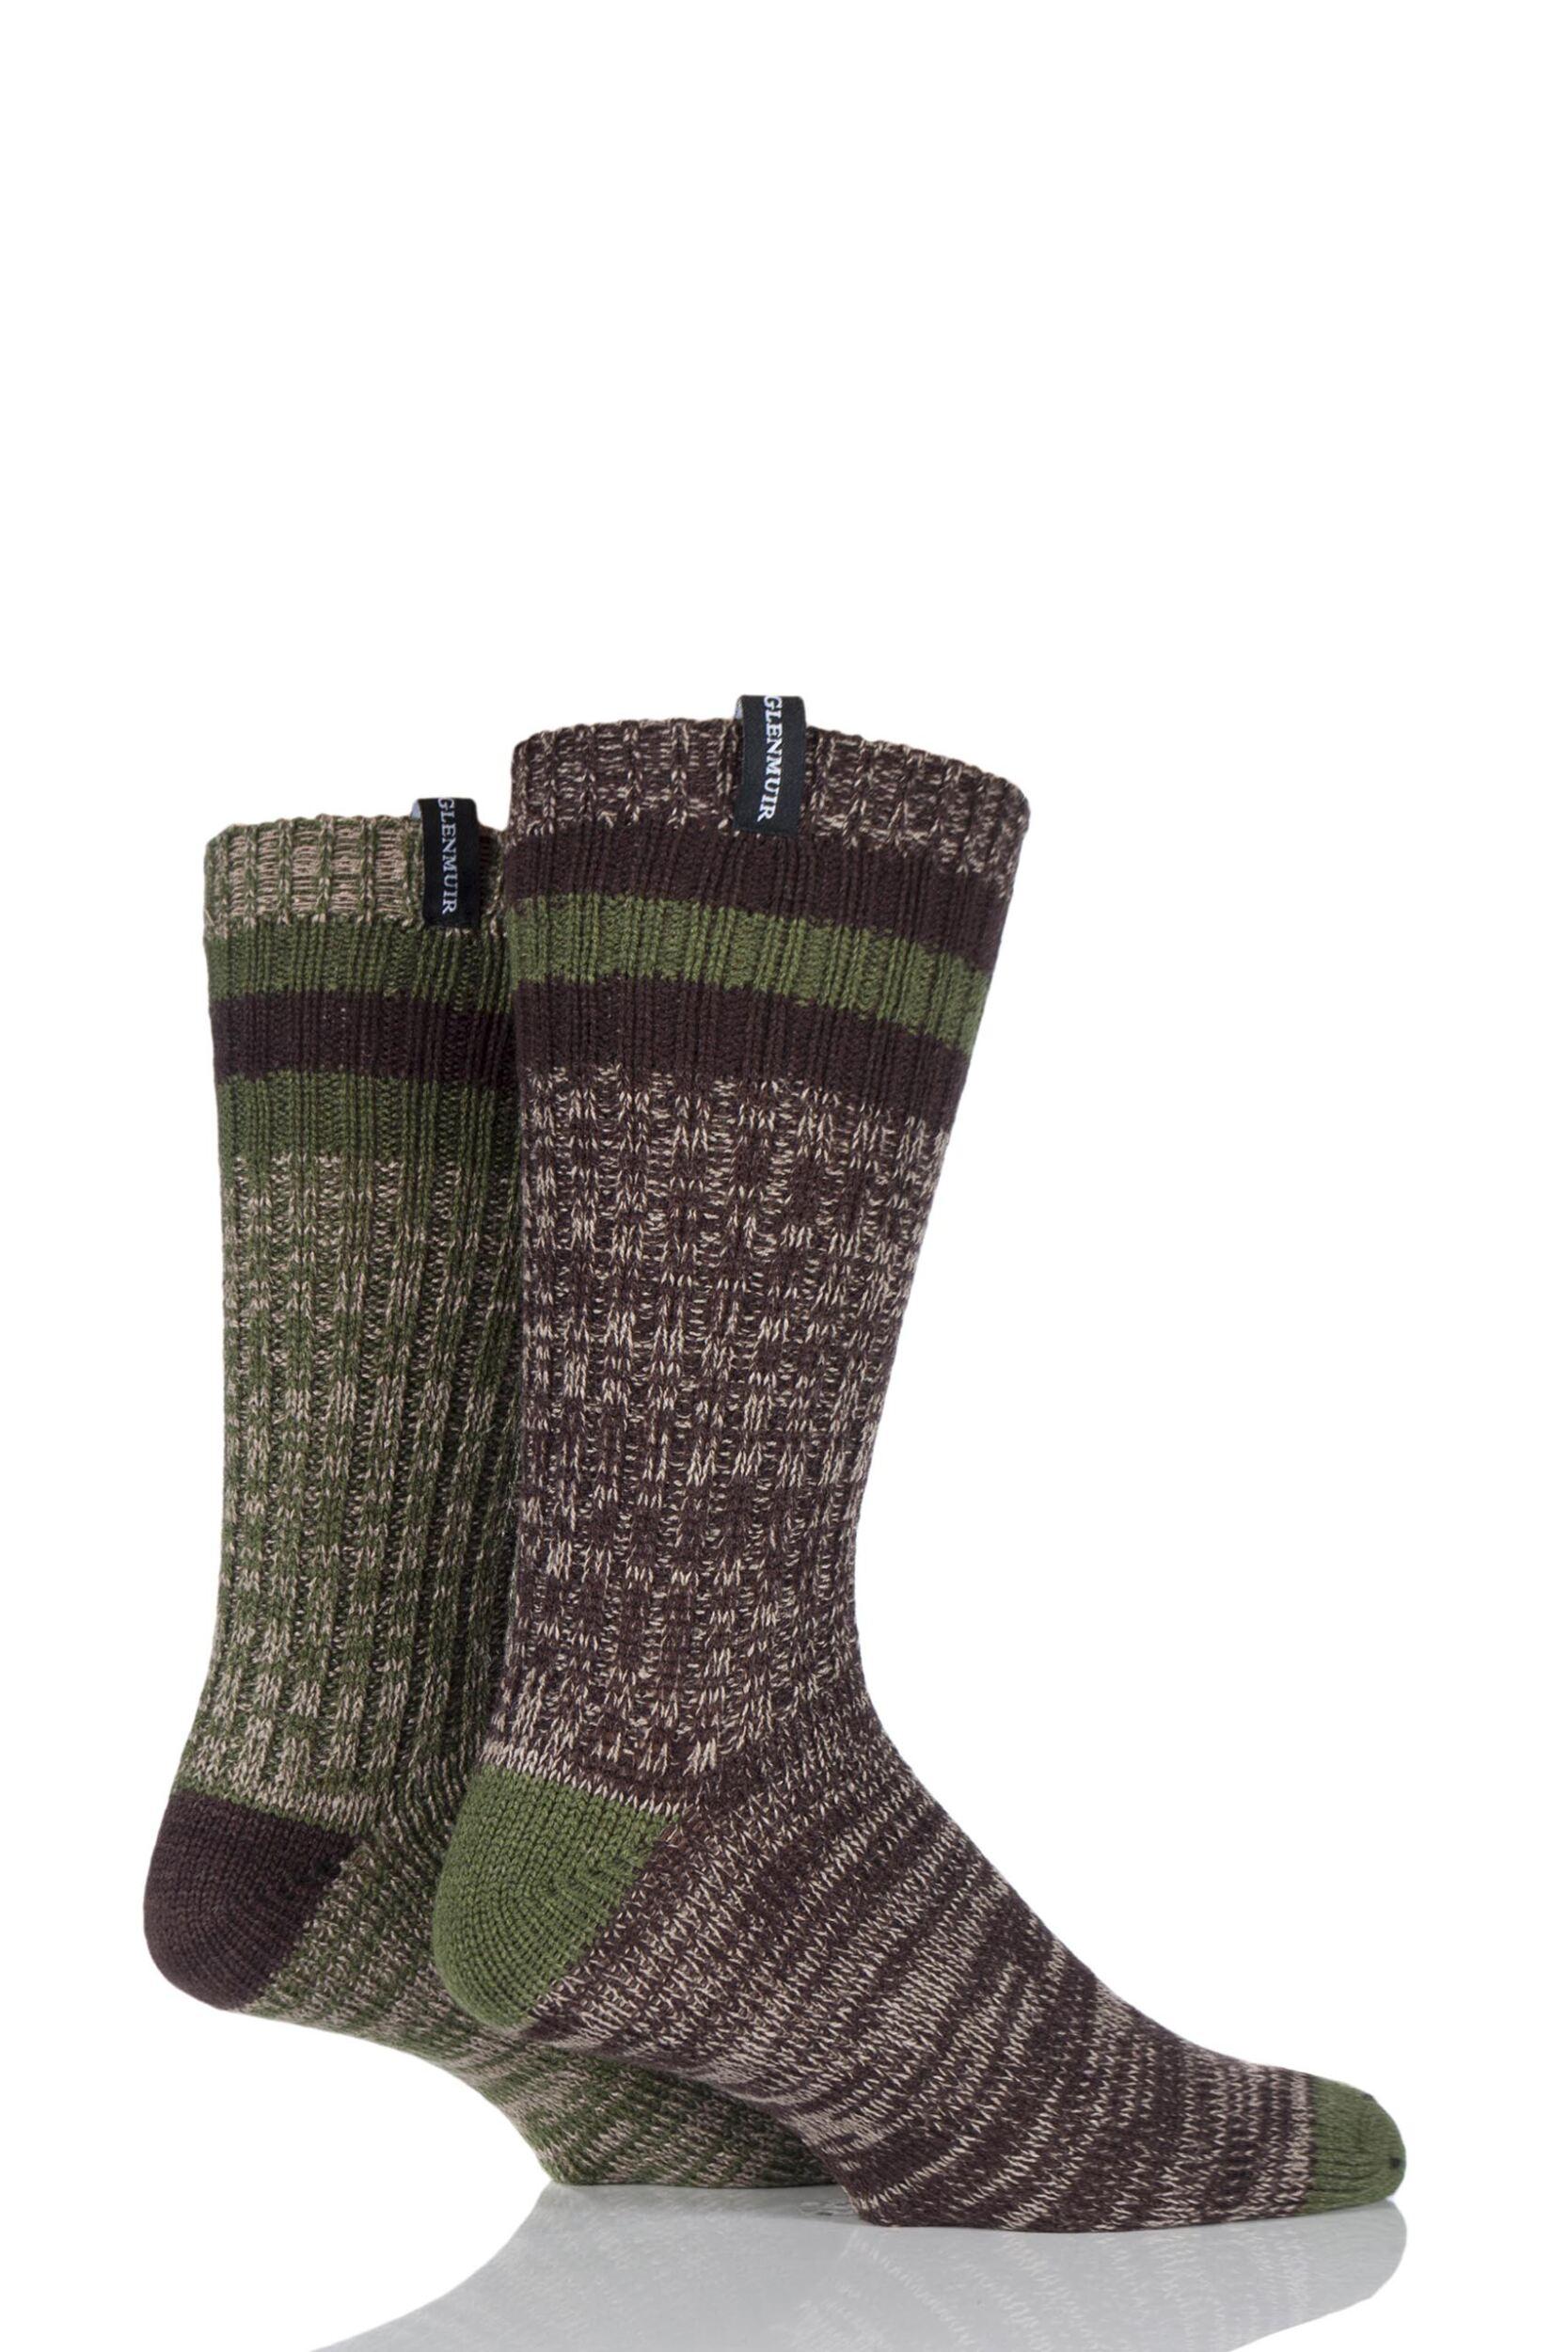 mens 2 pair glenmuir wool blend plain marl boot socks with